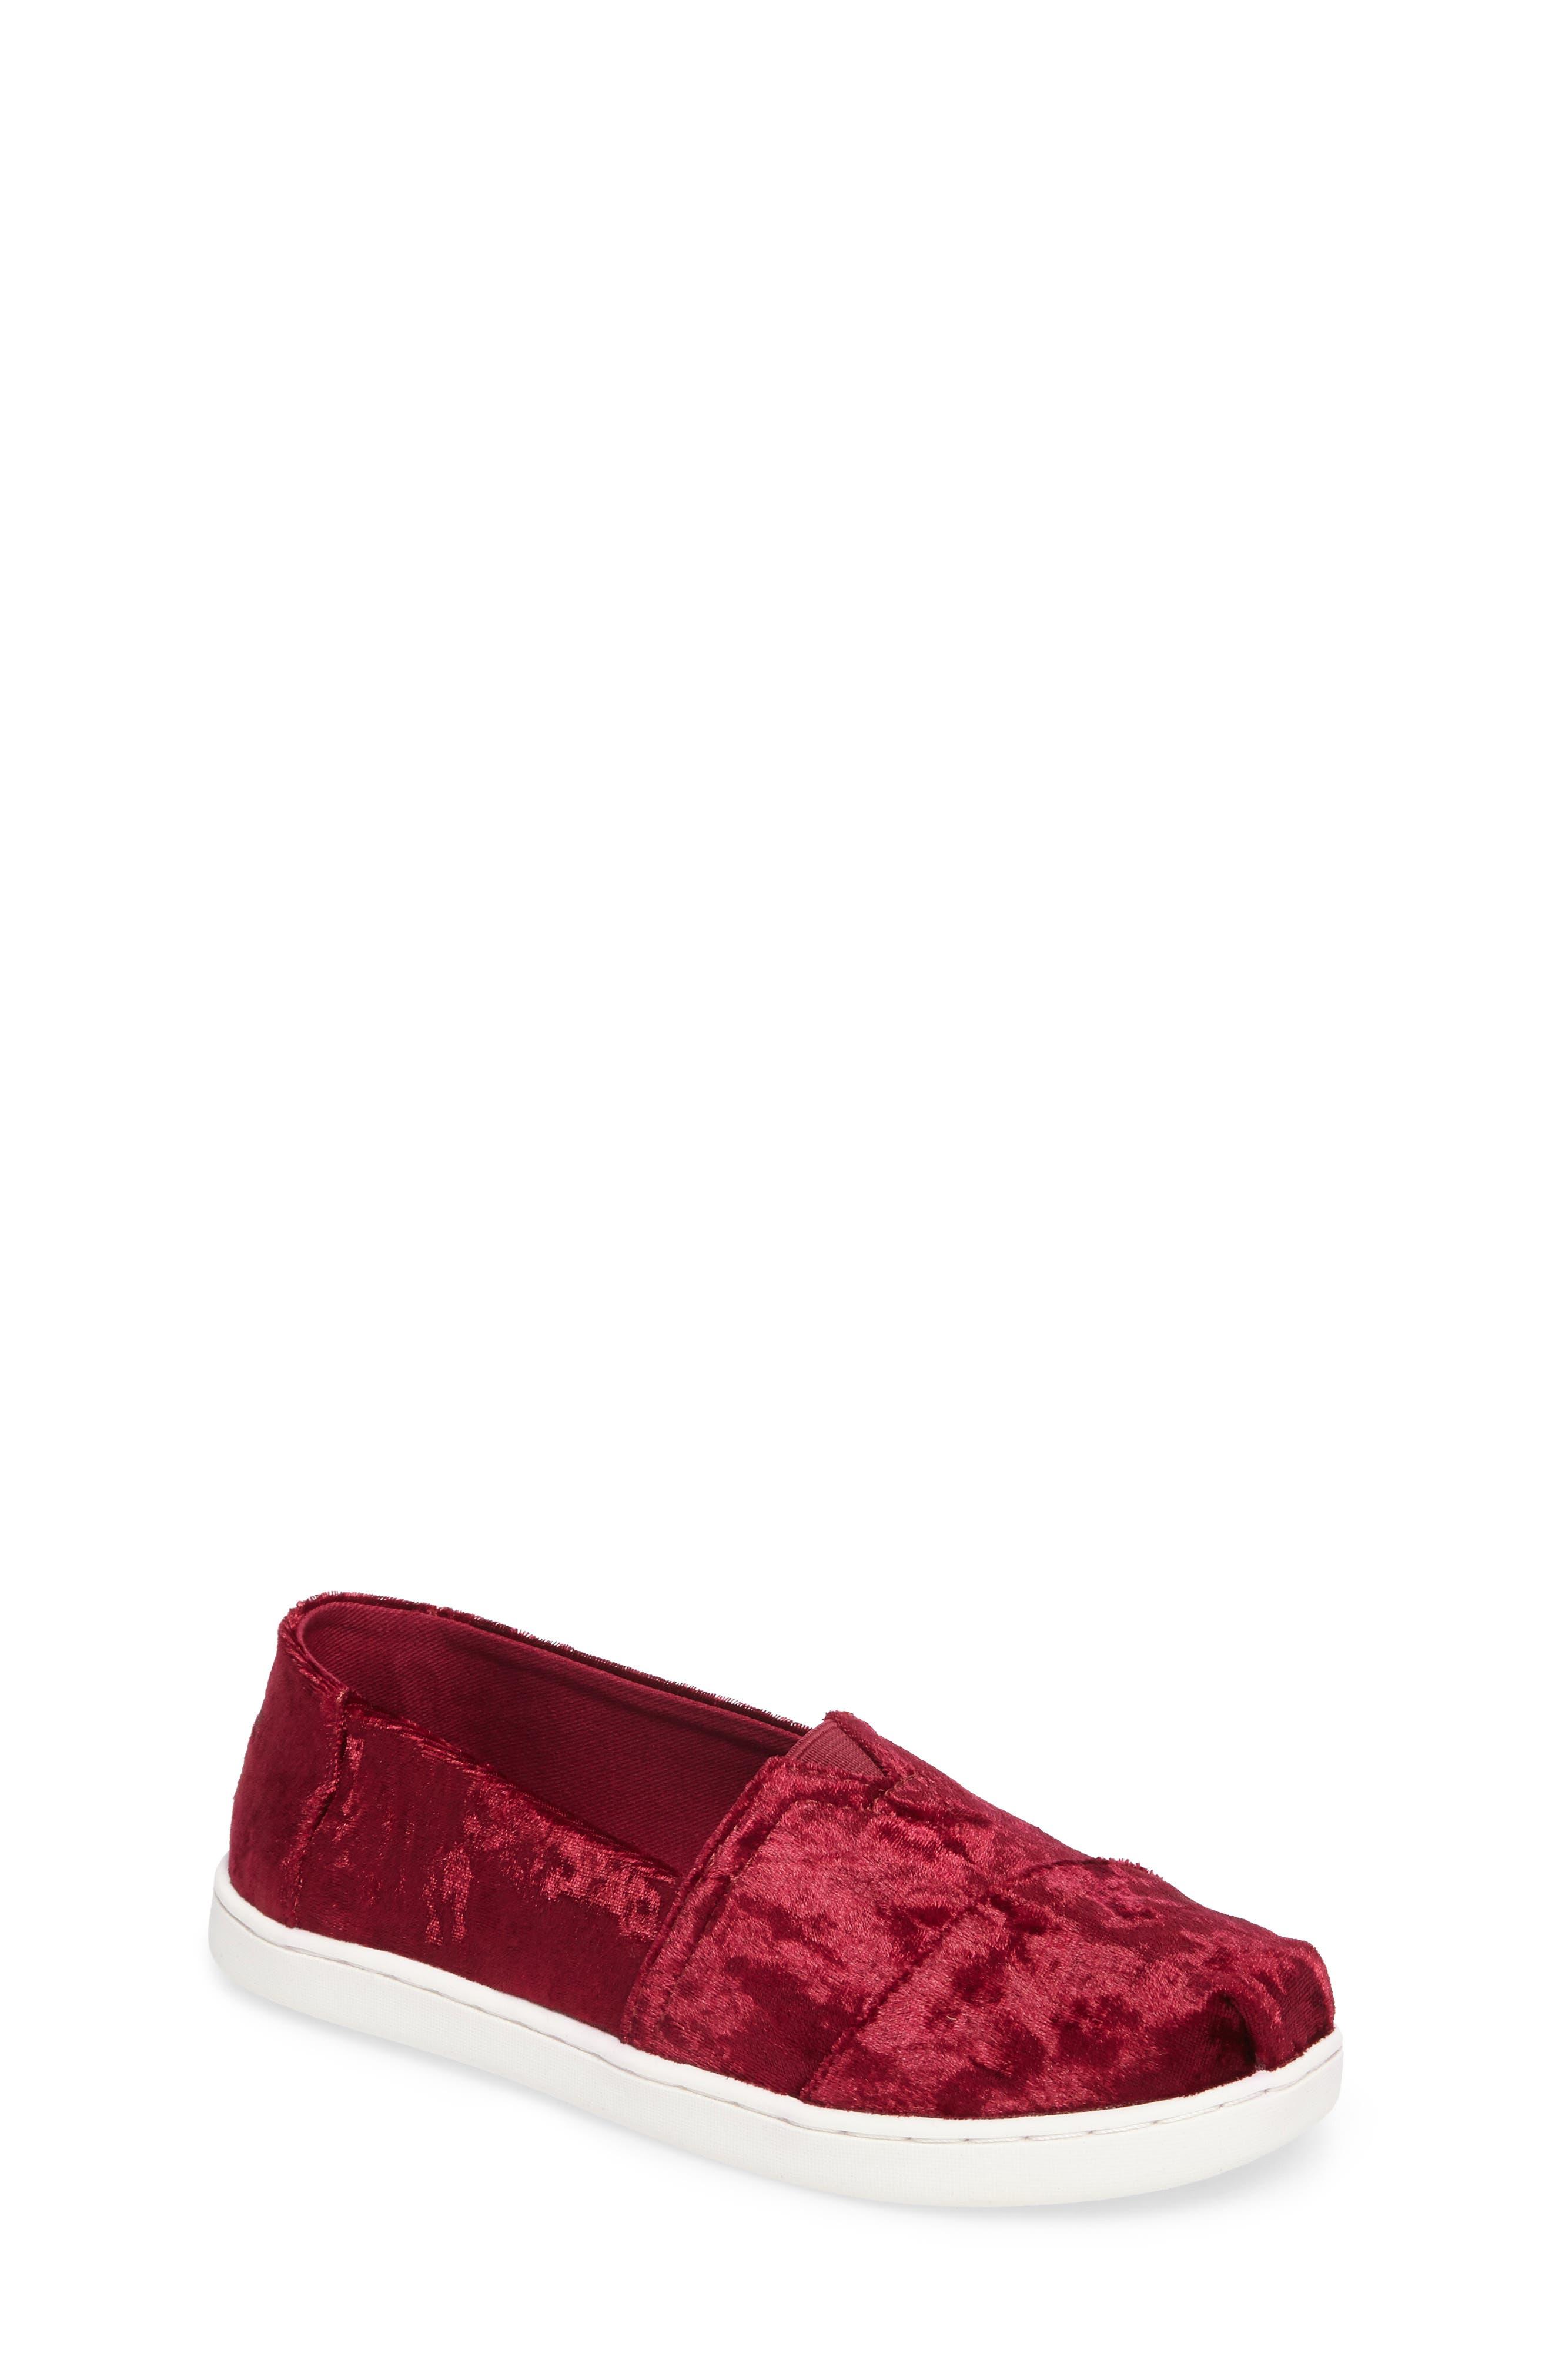 Classic Alpargata Slip-On,                         Main,                         color, Black Cherry Velvet